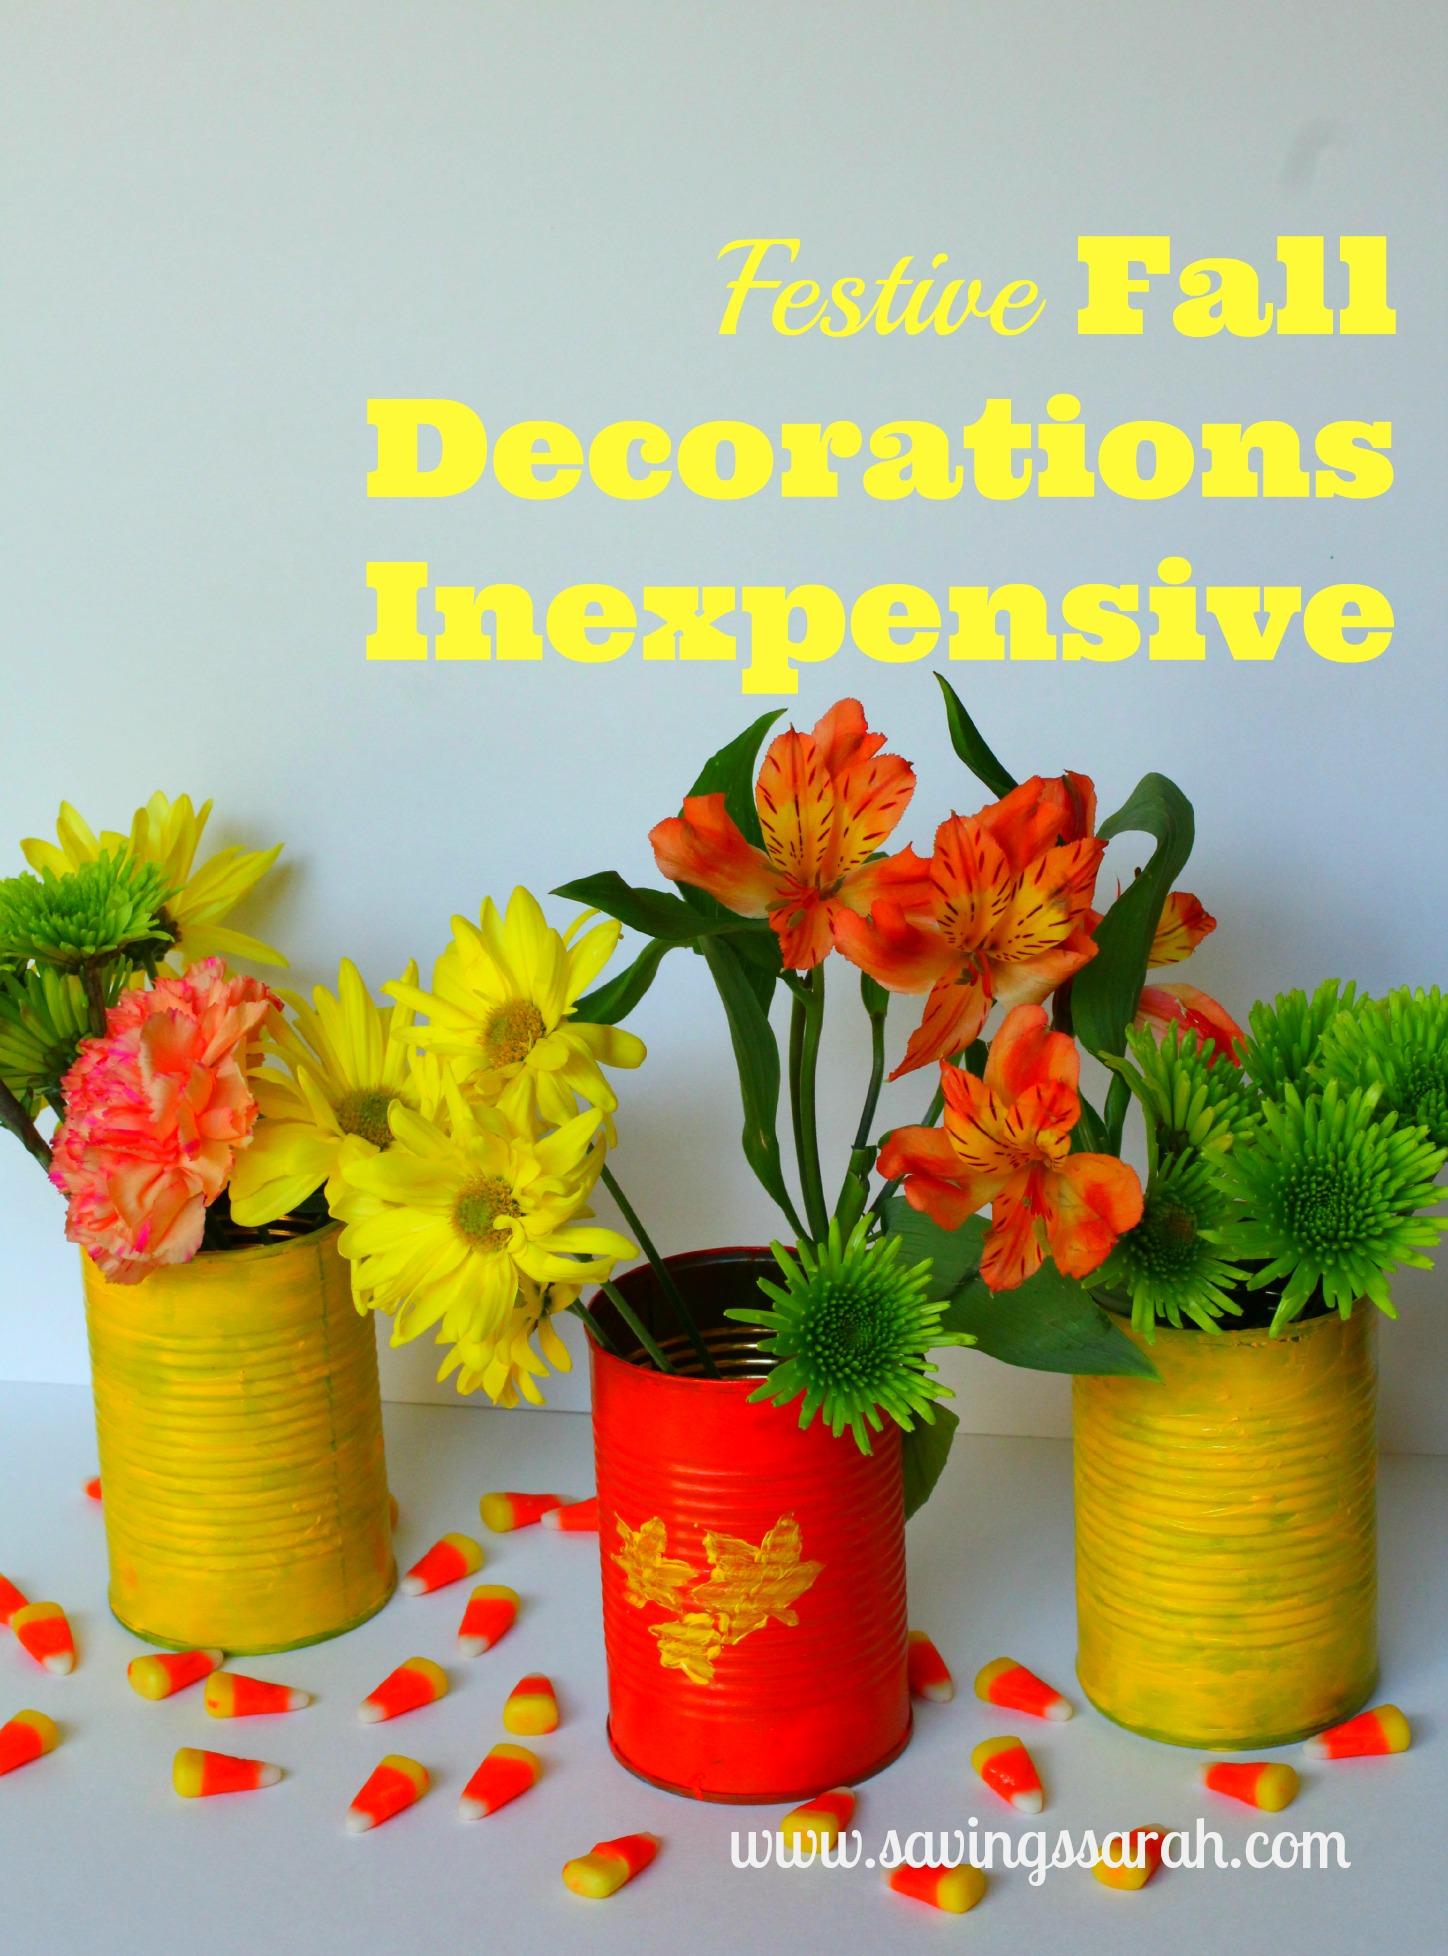 Festive Fall Decorations Inexpensive Fun